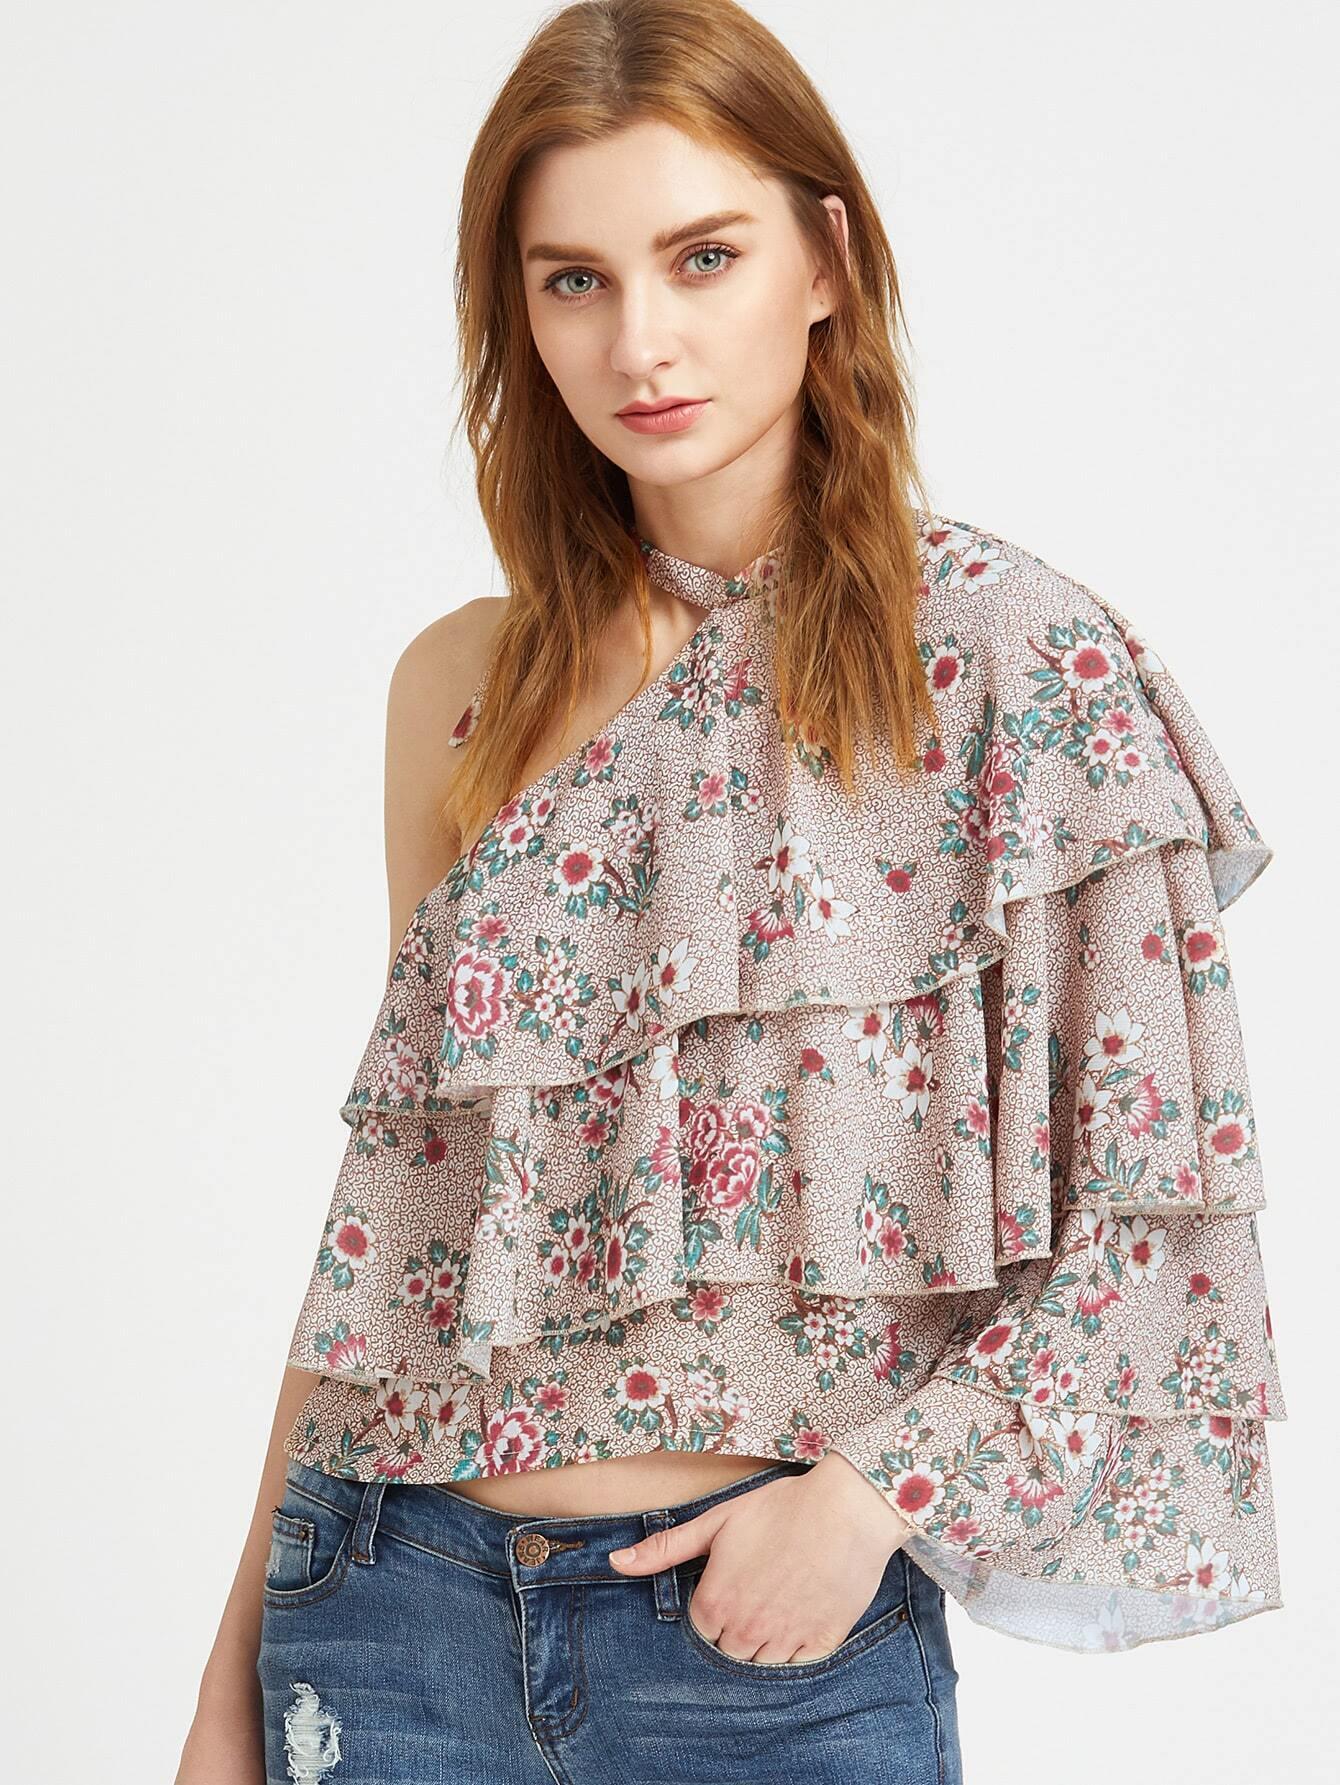 blouse170317203_2